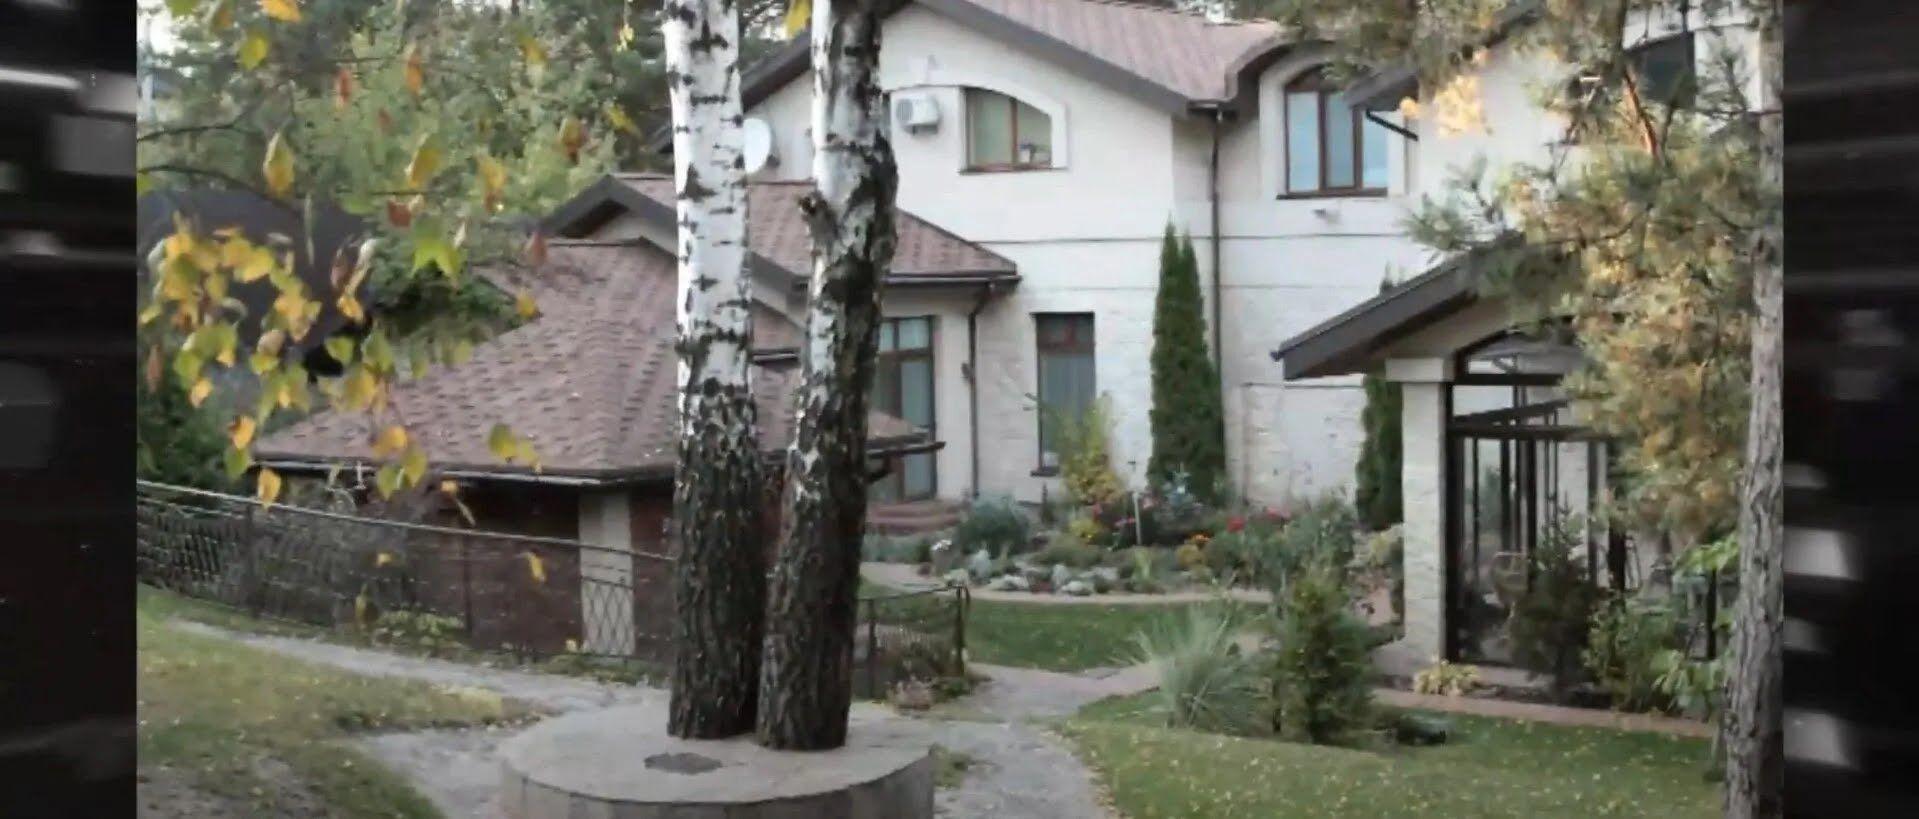 Як виглядає будинок Лободи.